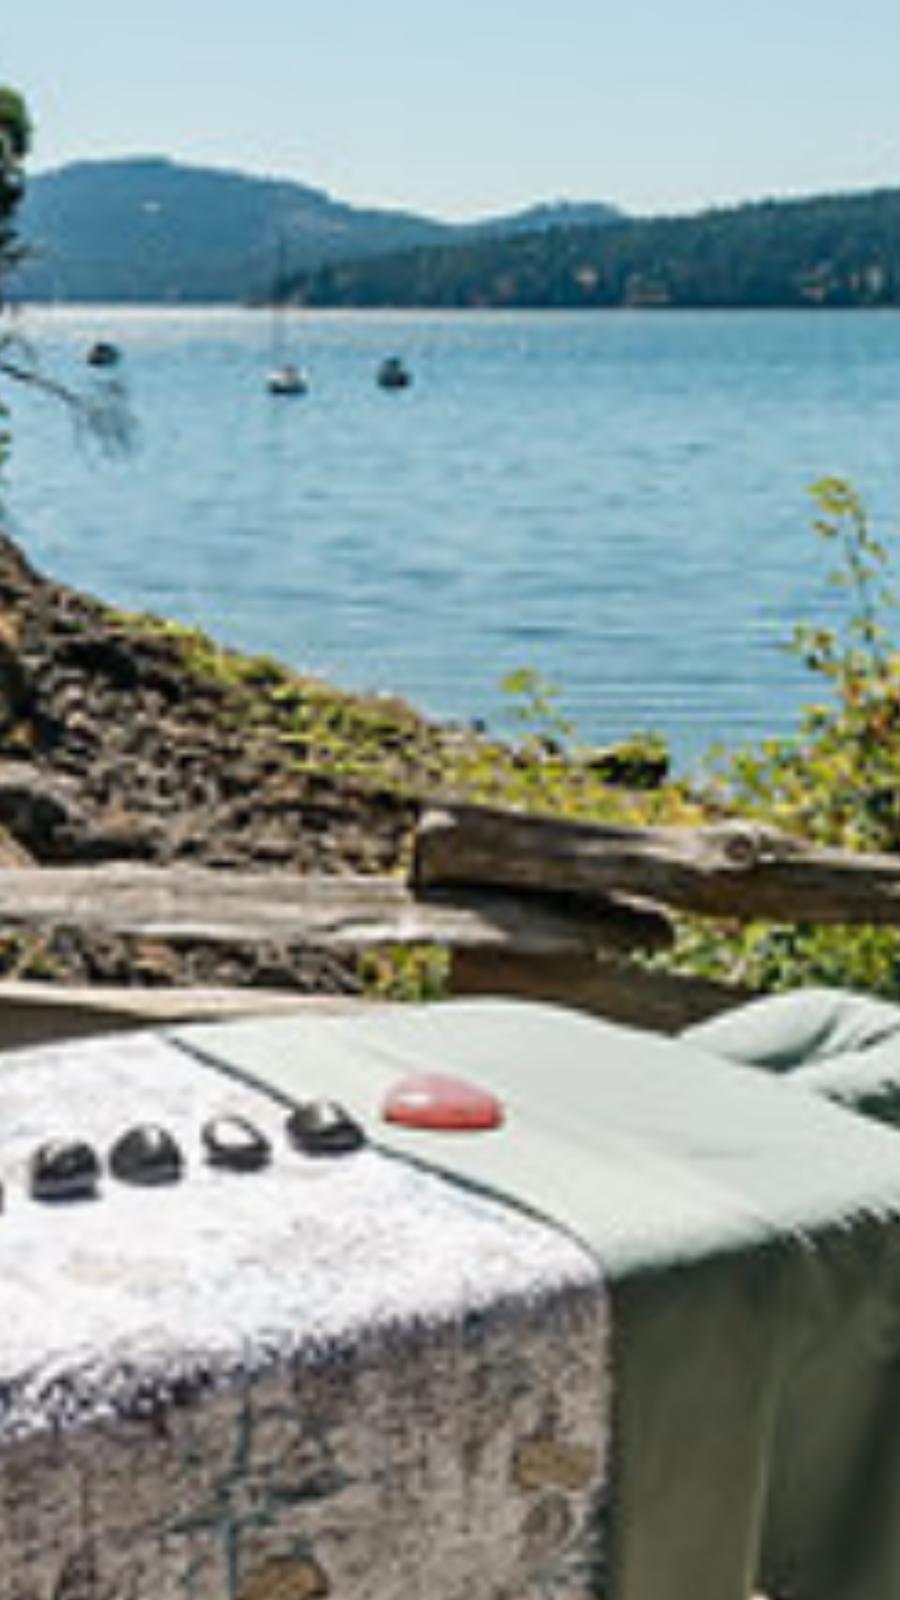 A Massage by the Sea | health | 344 Main St #103, Eastsound, WA 98245, USA | 2064864325 OR +1 206-486-4325